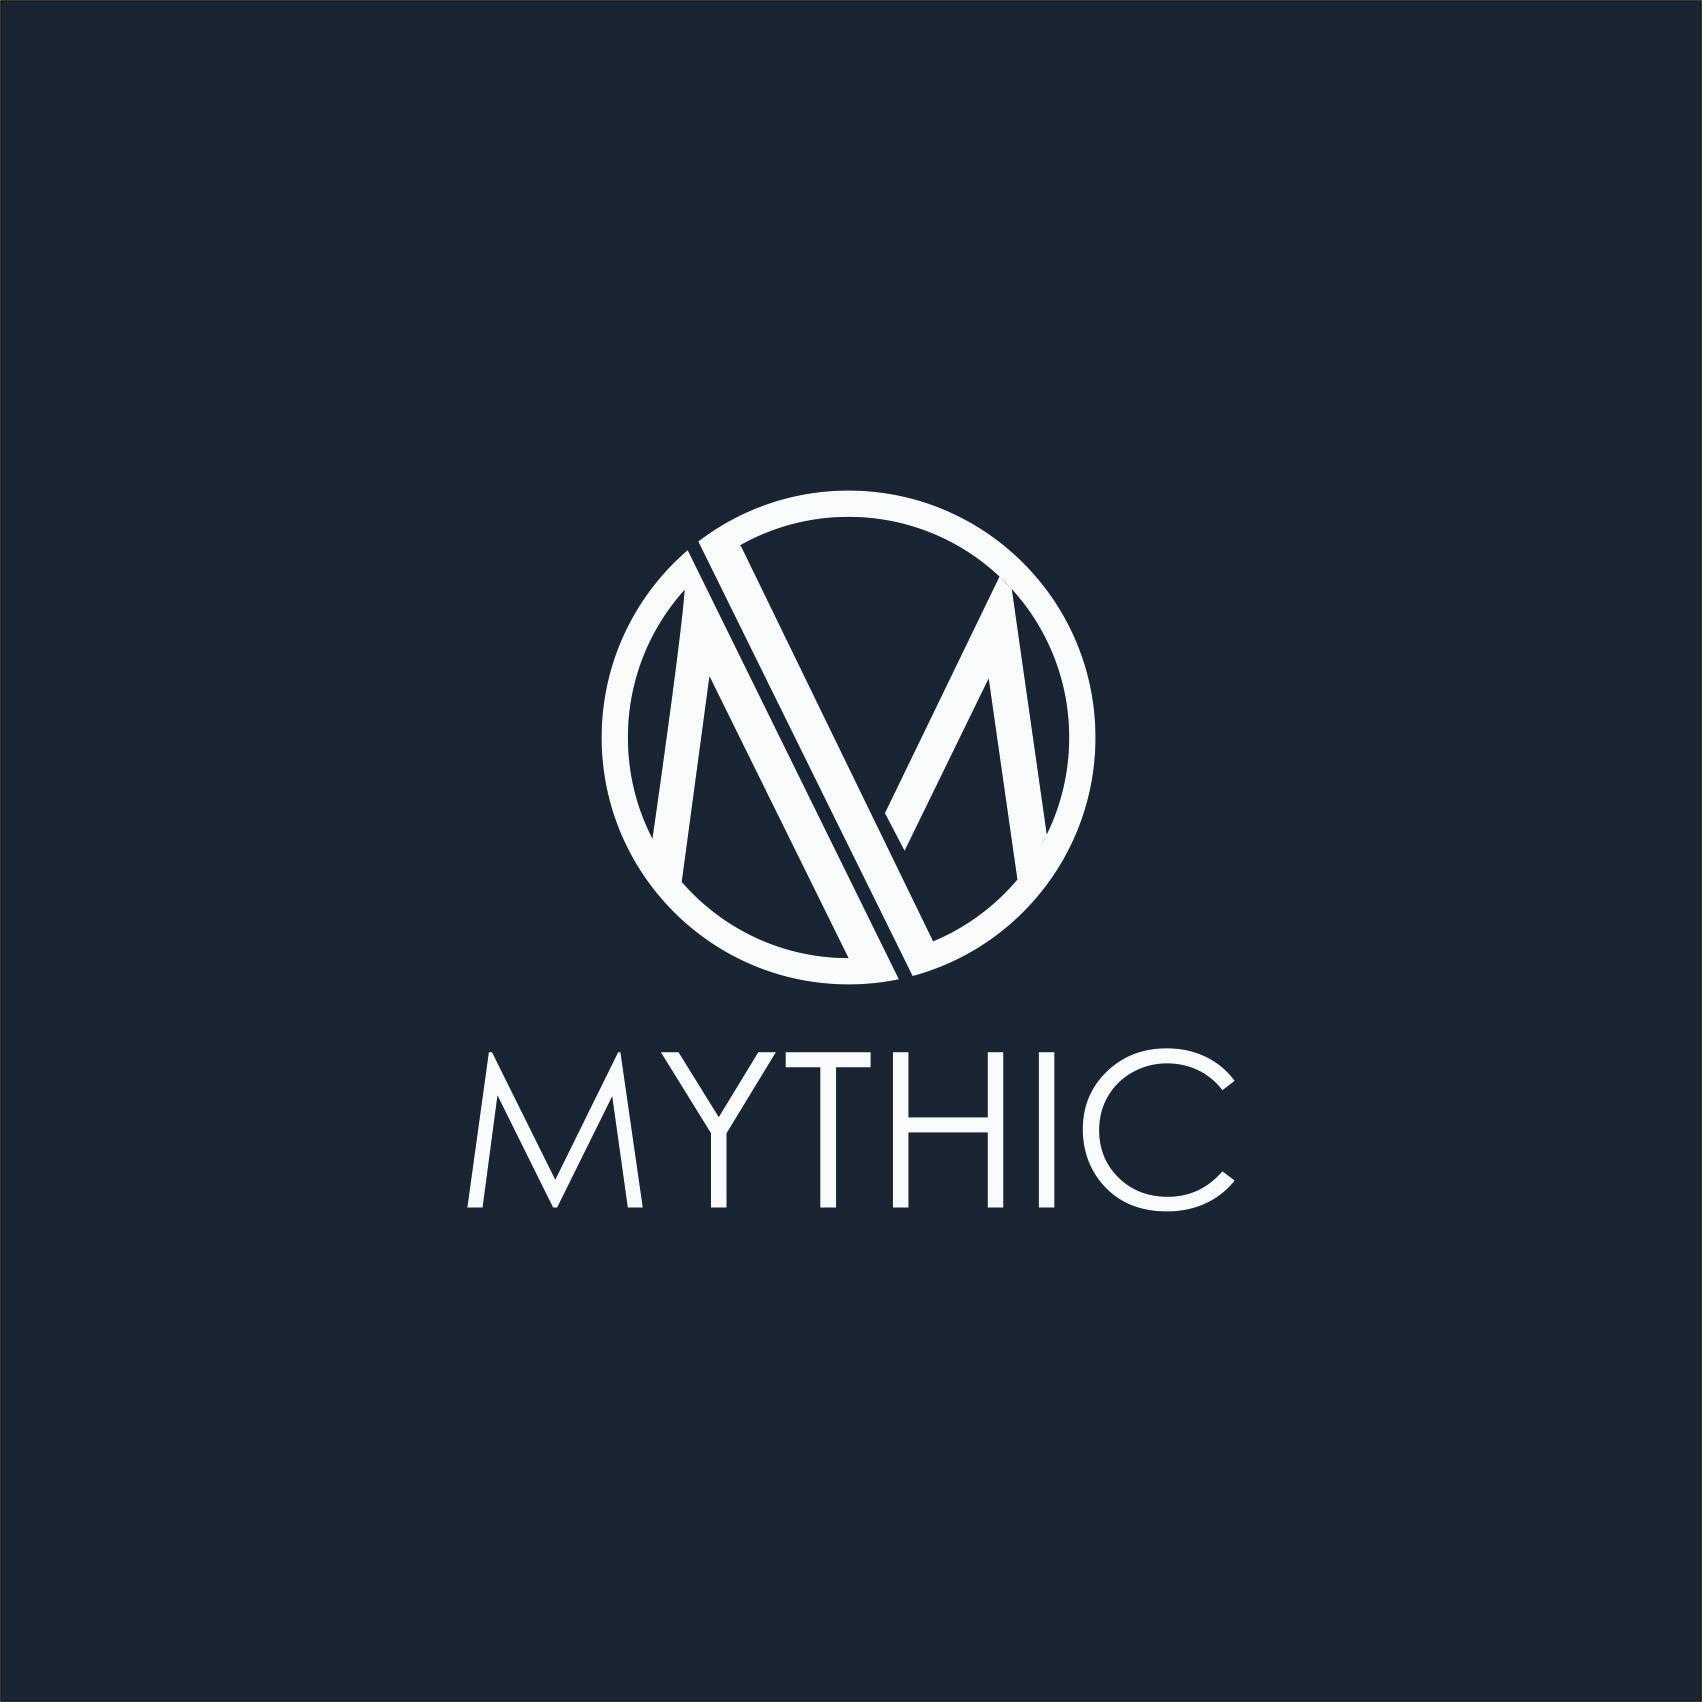 Design a creative logo for the light bulb company Mythic